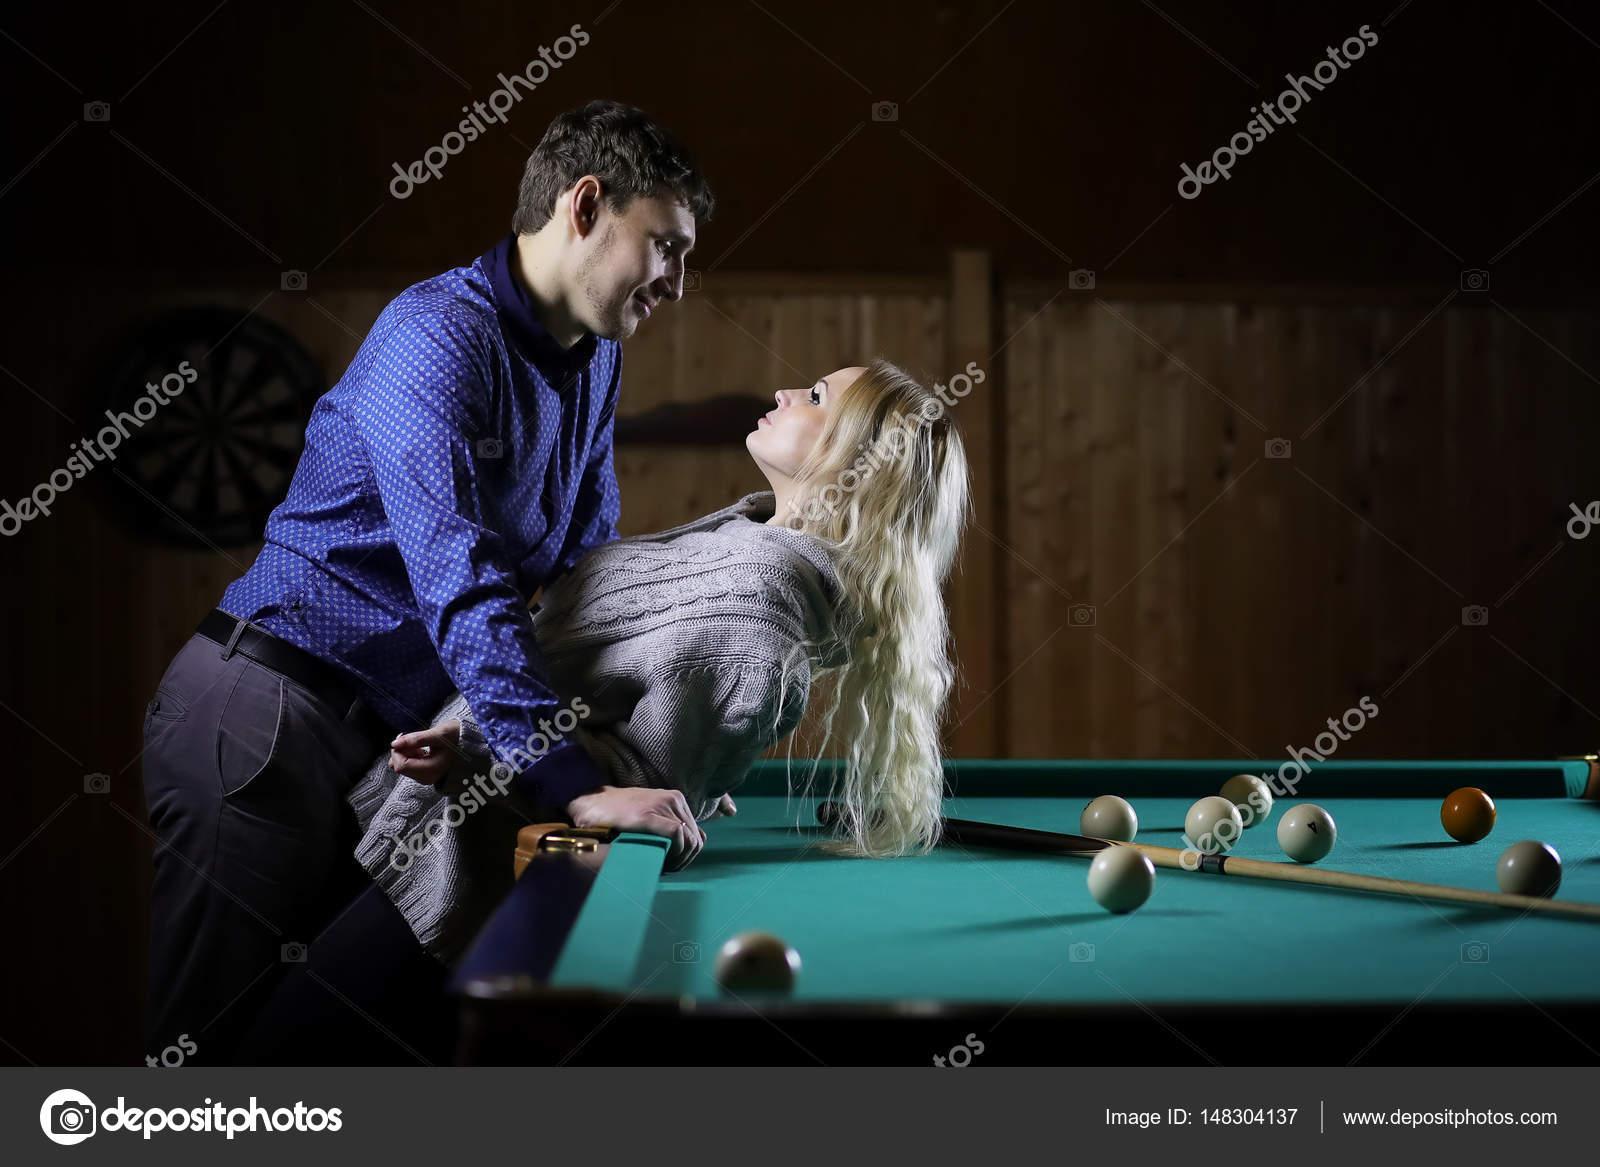 pity, that now Flirten lernen f r frauen buch matchless theme